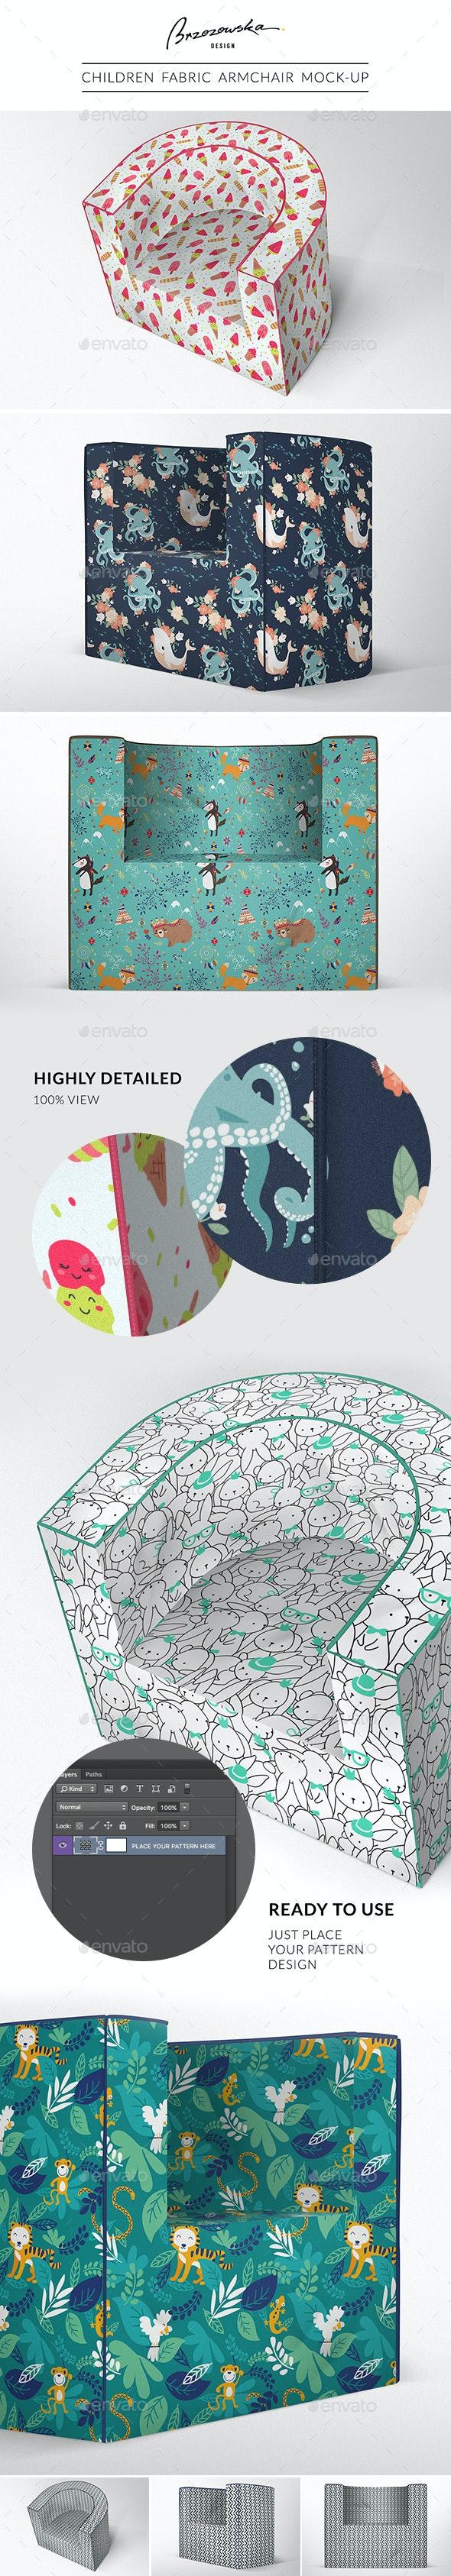 Children Fabric Armchair Mock-up - Product Mock-Ups Graphics